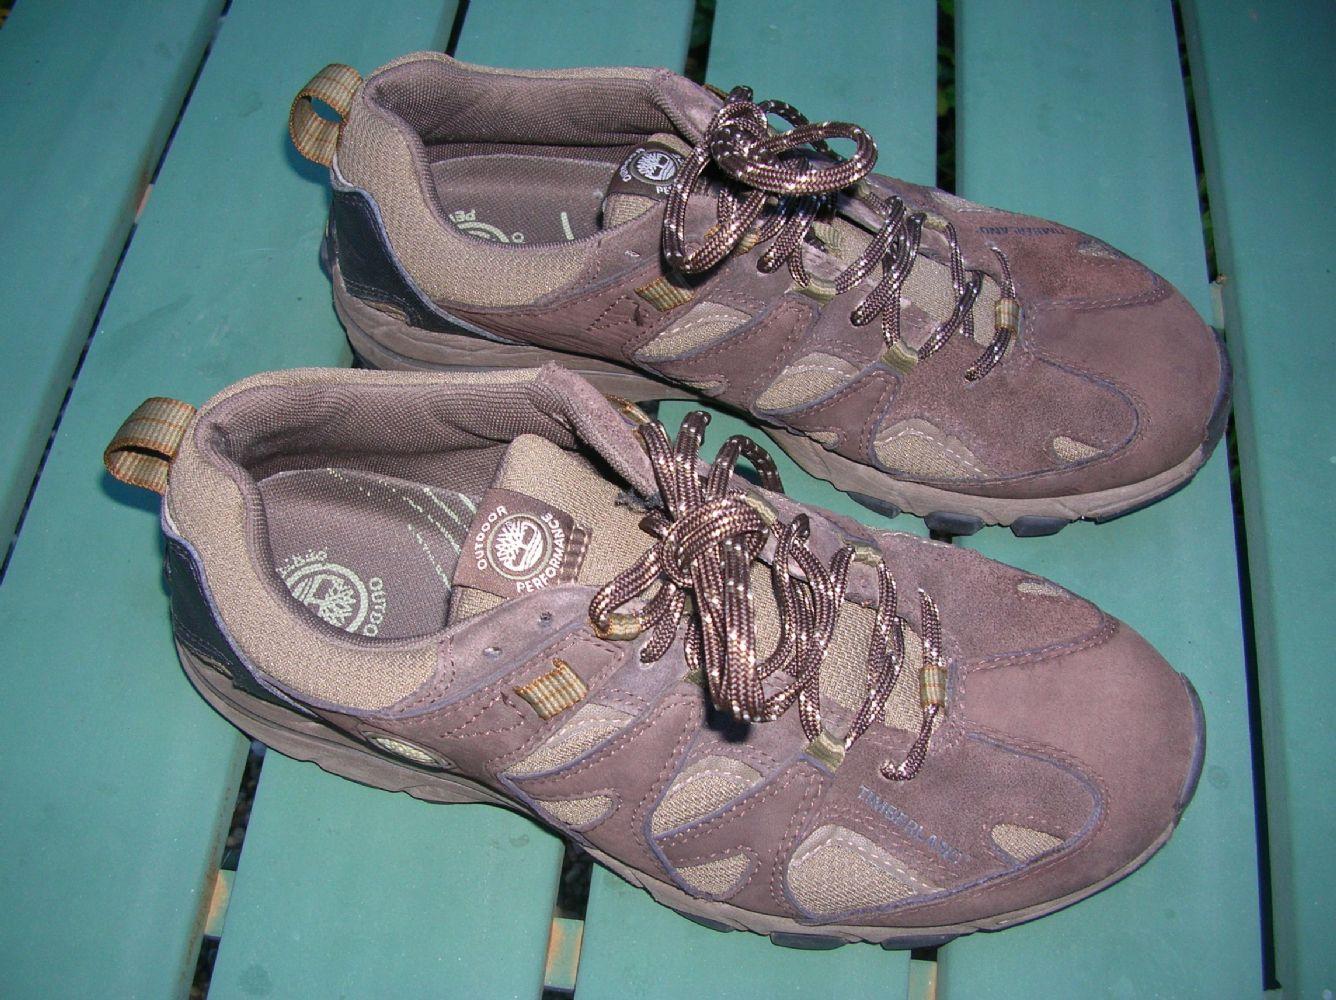 Descrizione Magnifiche scarpe da trekking originali Timberland. Misura 9 8b8968cd1b9